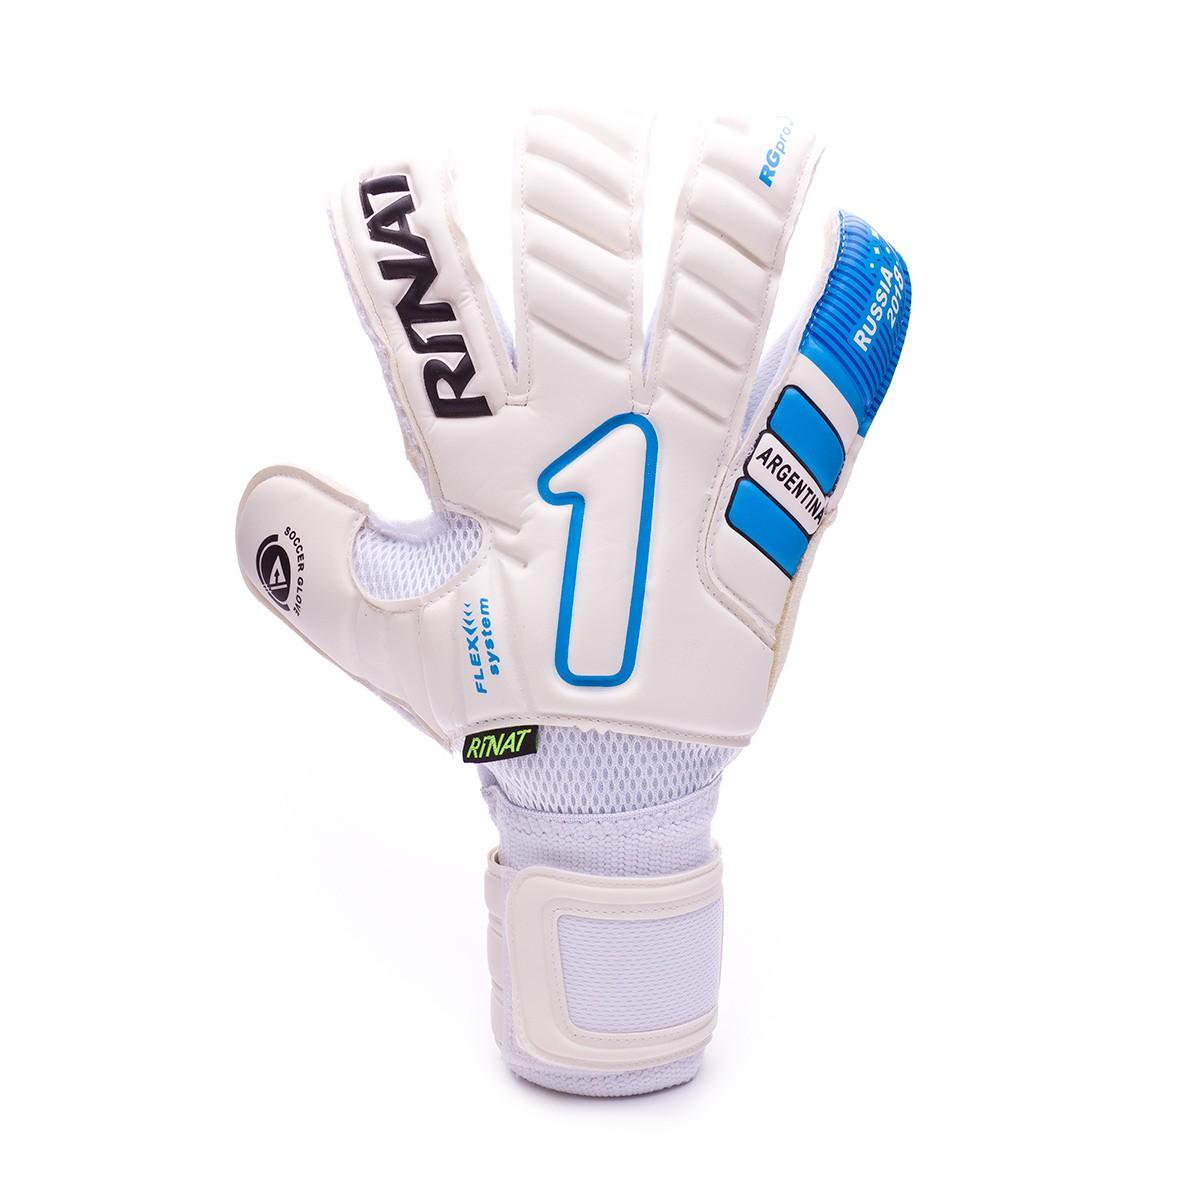 da54ae790 Glove Rinat Egotiko Cup Semi Argentina - Football store Fútbol Emotion